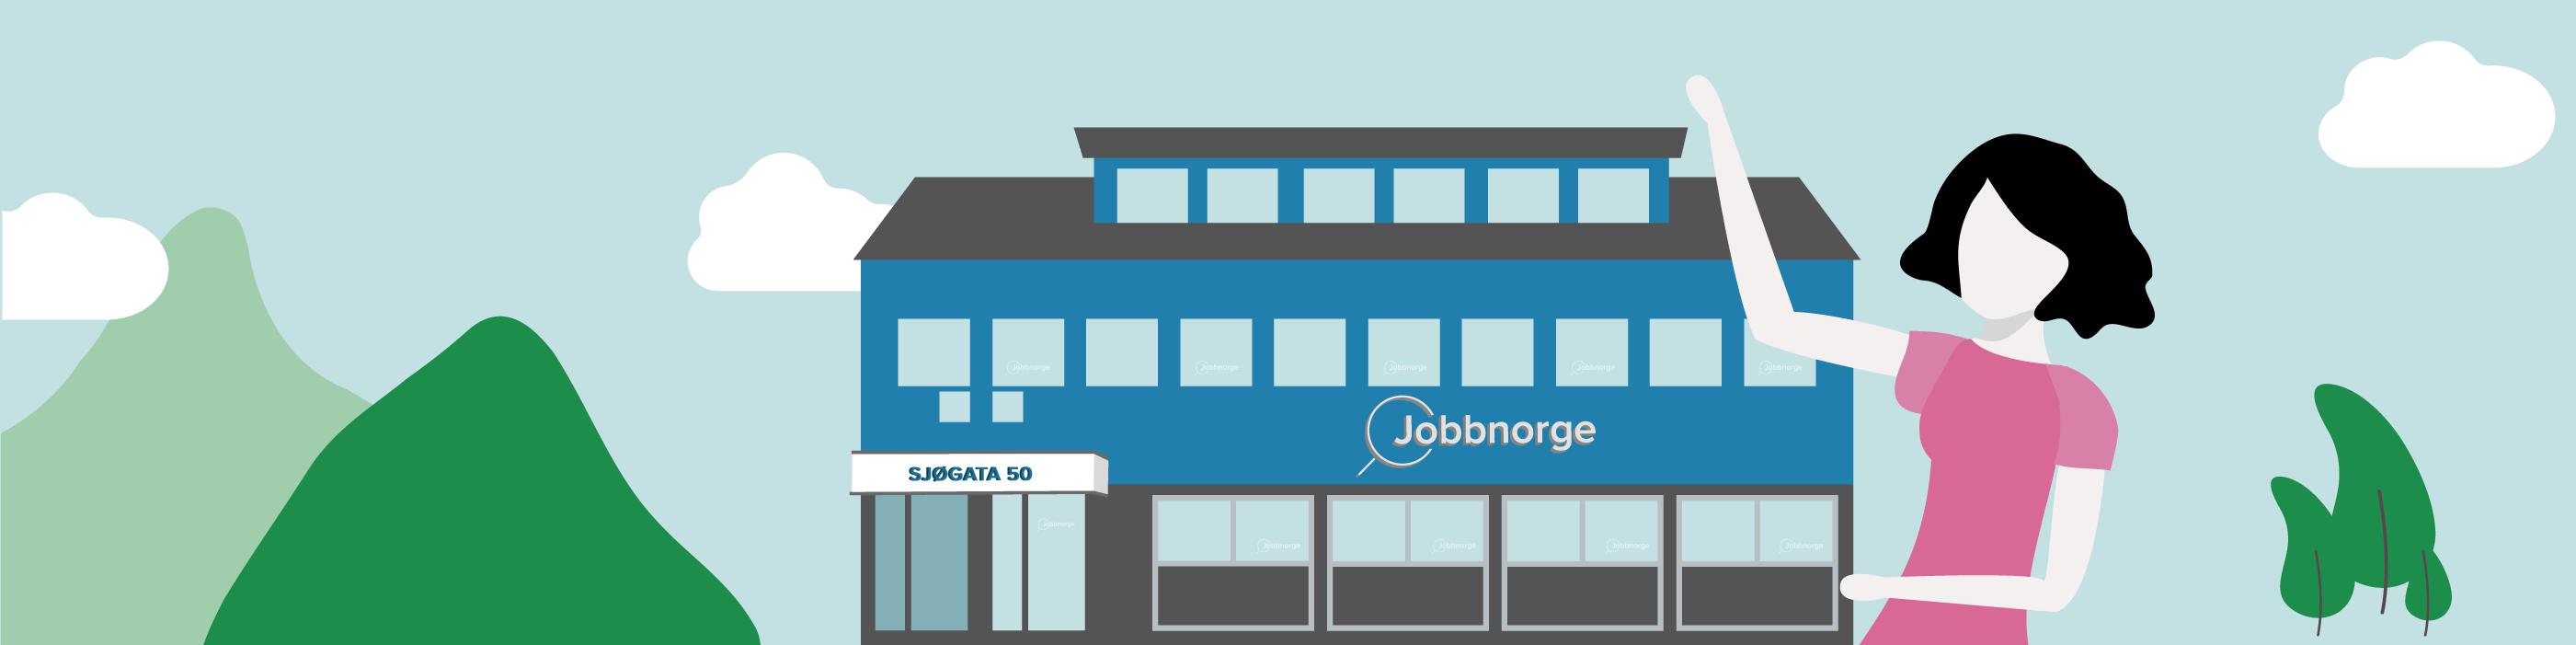 Jobbnorge building